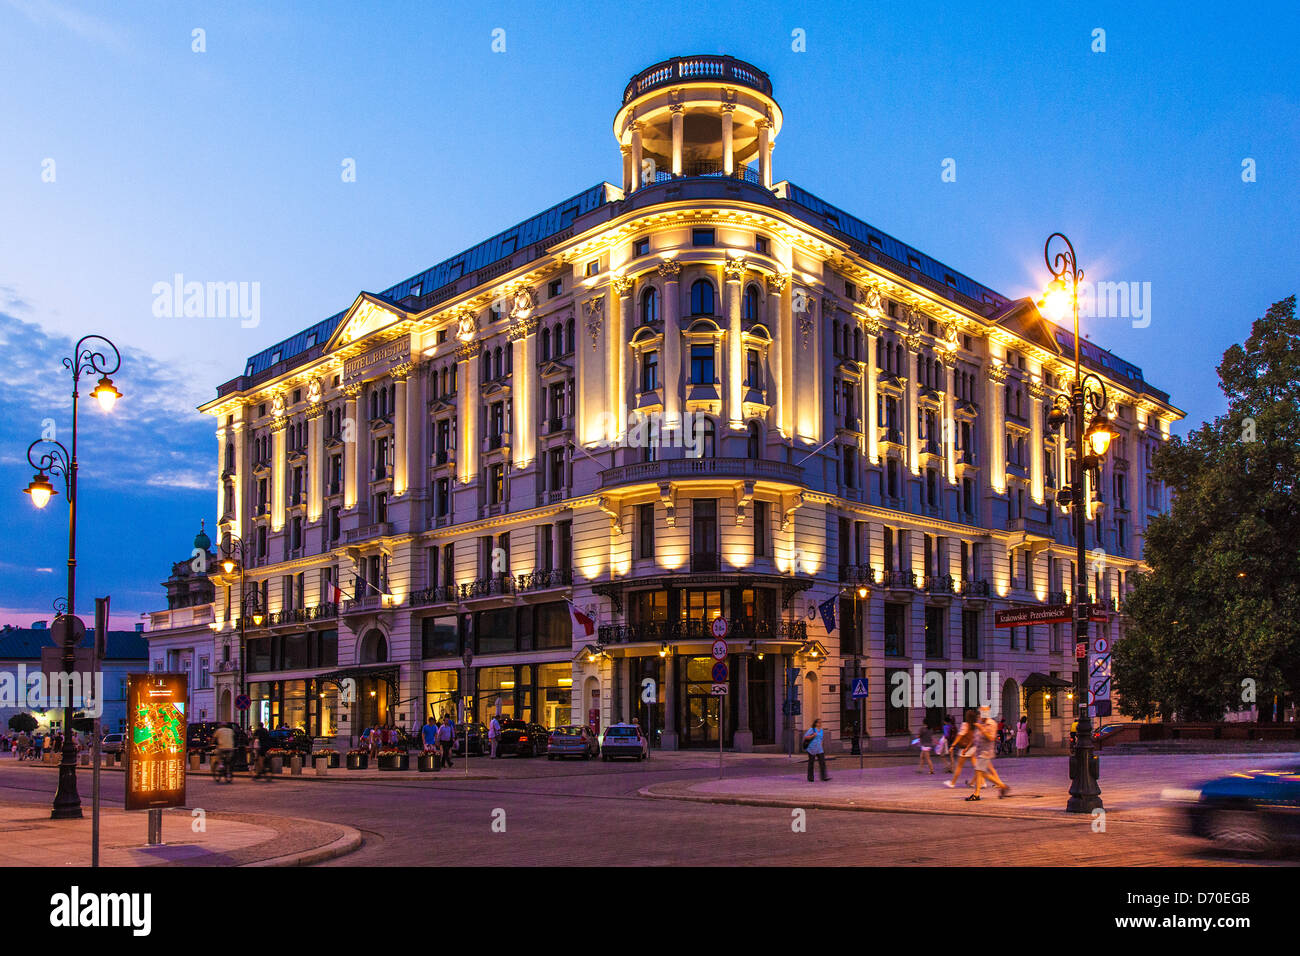 The 5 Star Hotel Bristol In The Krakowskie Przedmiescie In